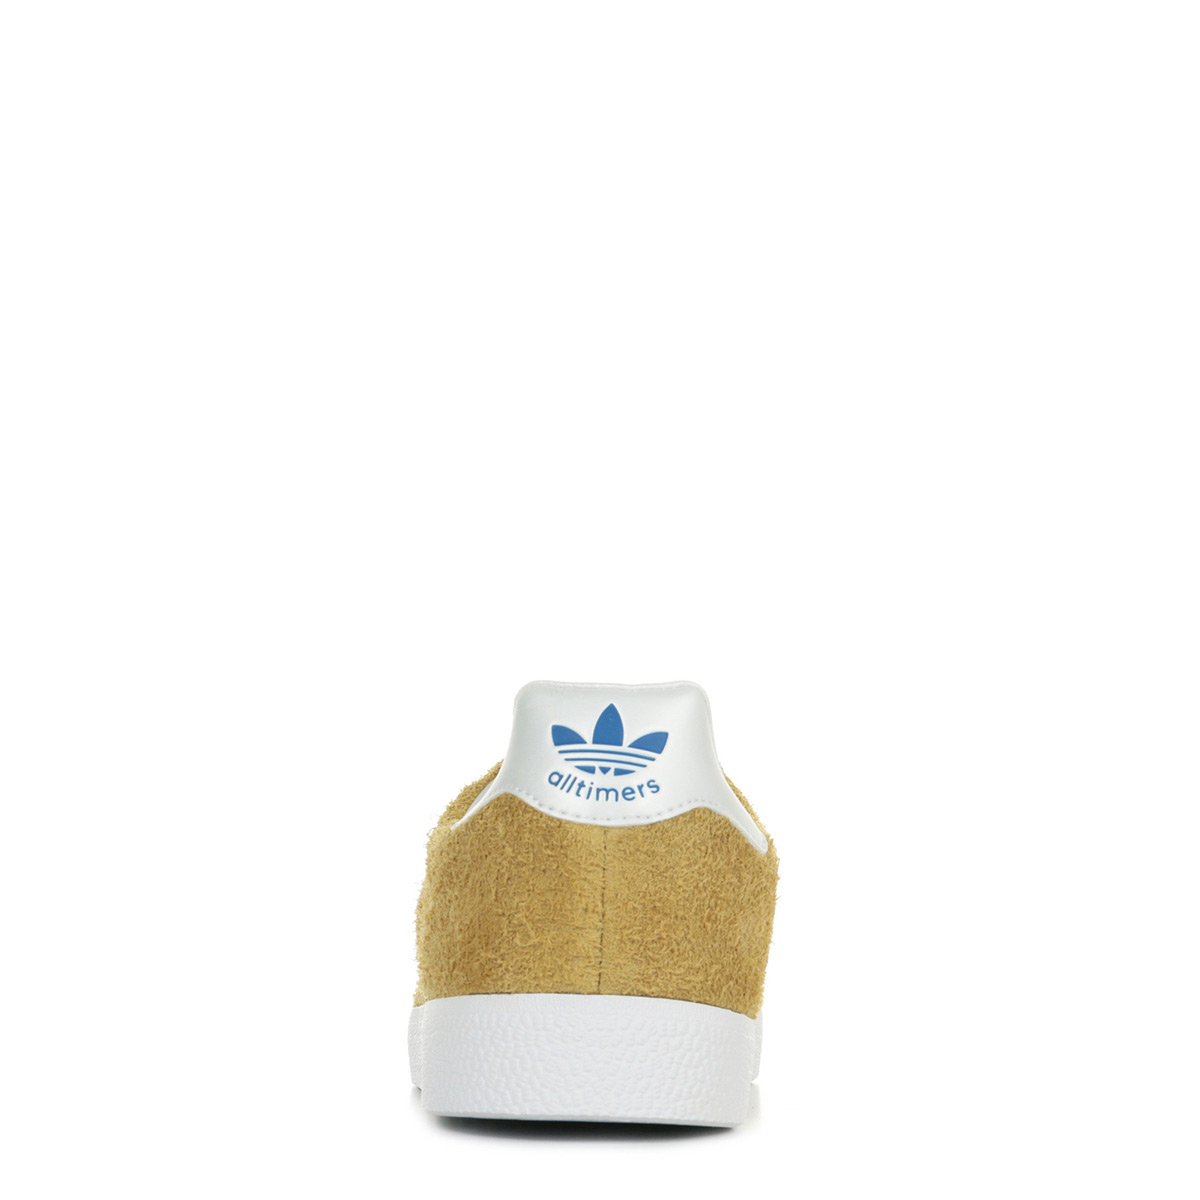 adidas Gazelle Super X Alltimers BB6998, Basket: